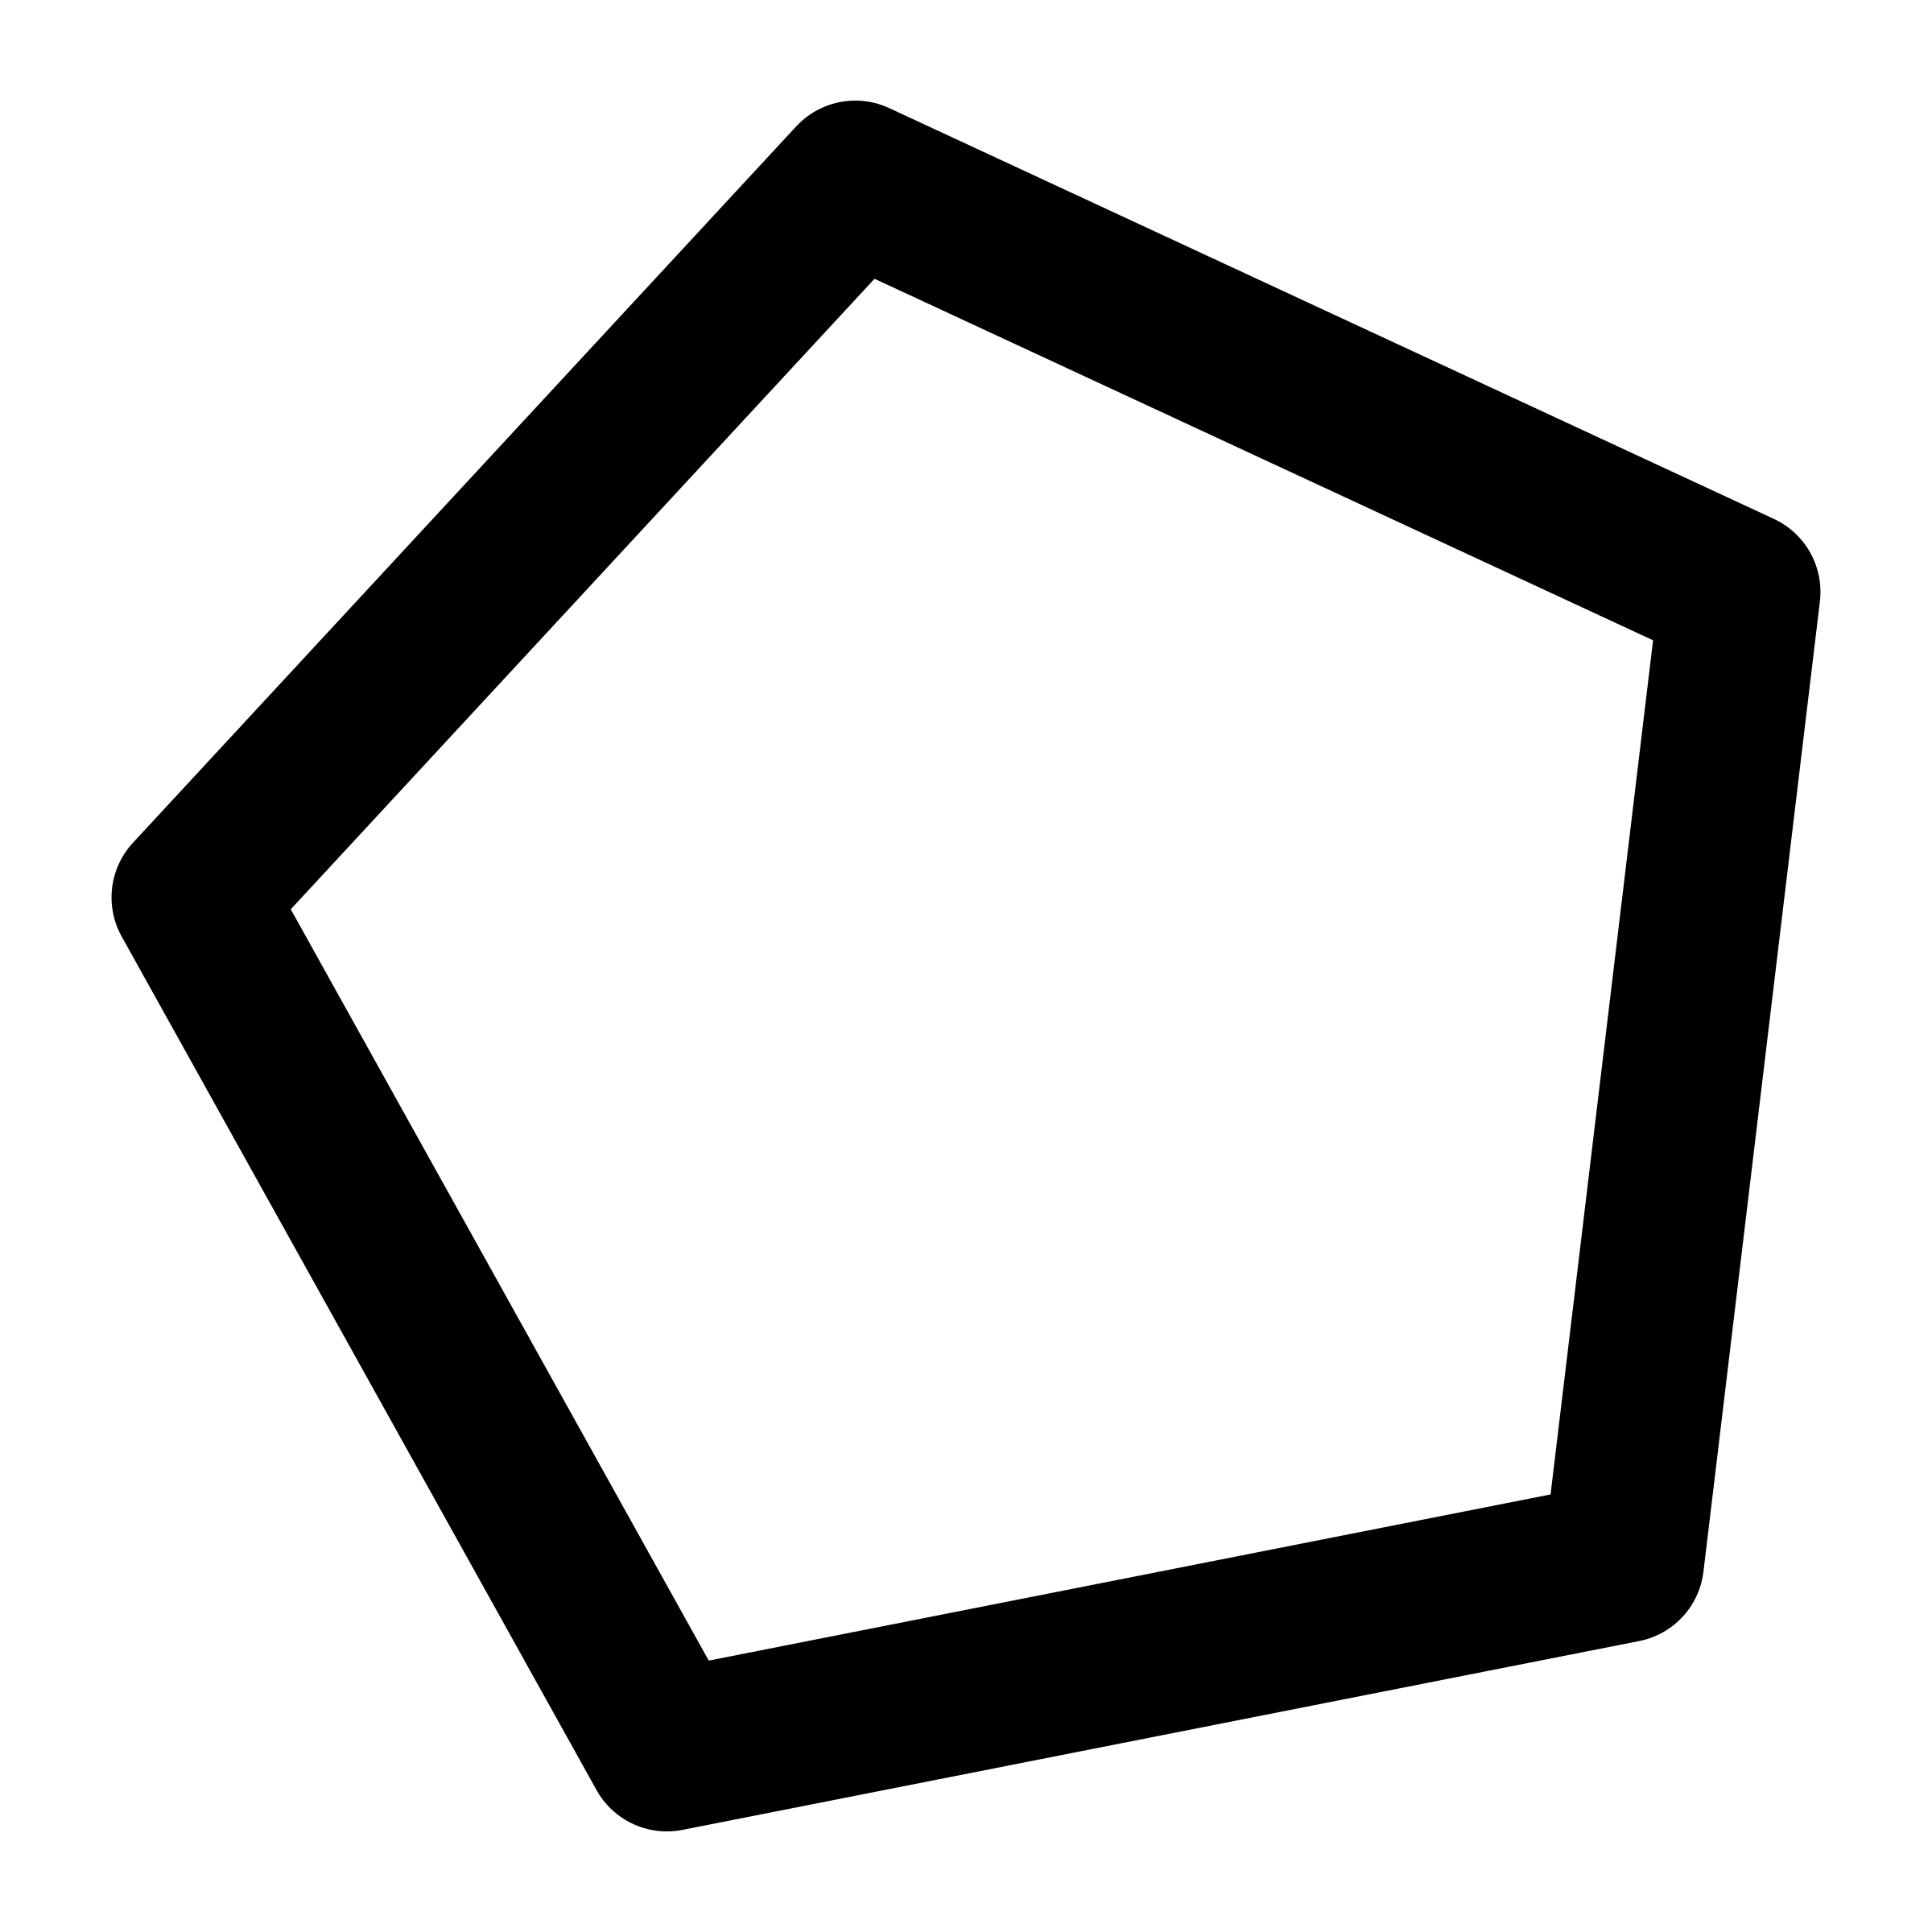 Polygon Clip Art.